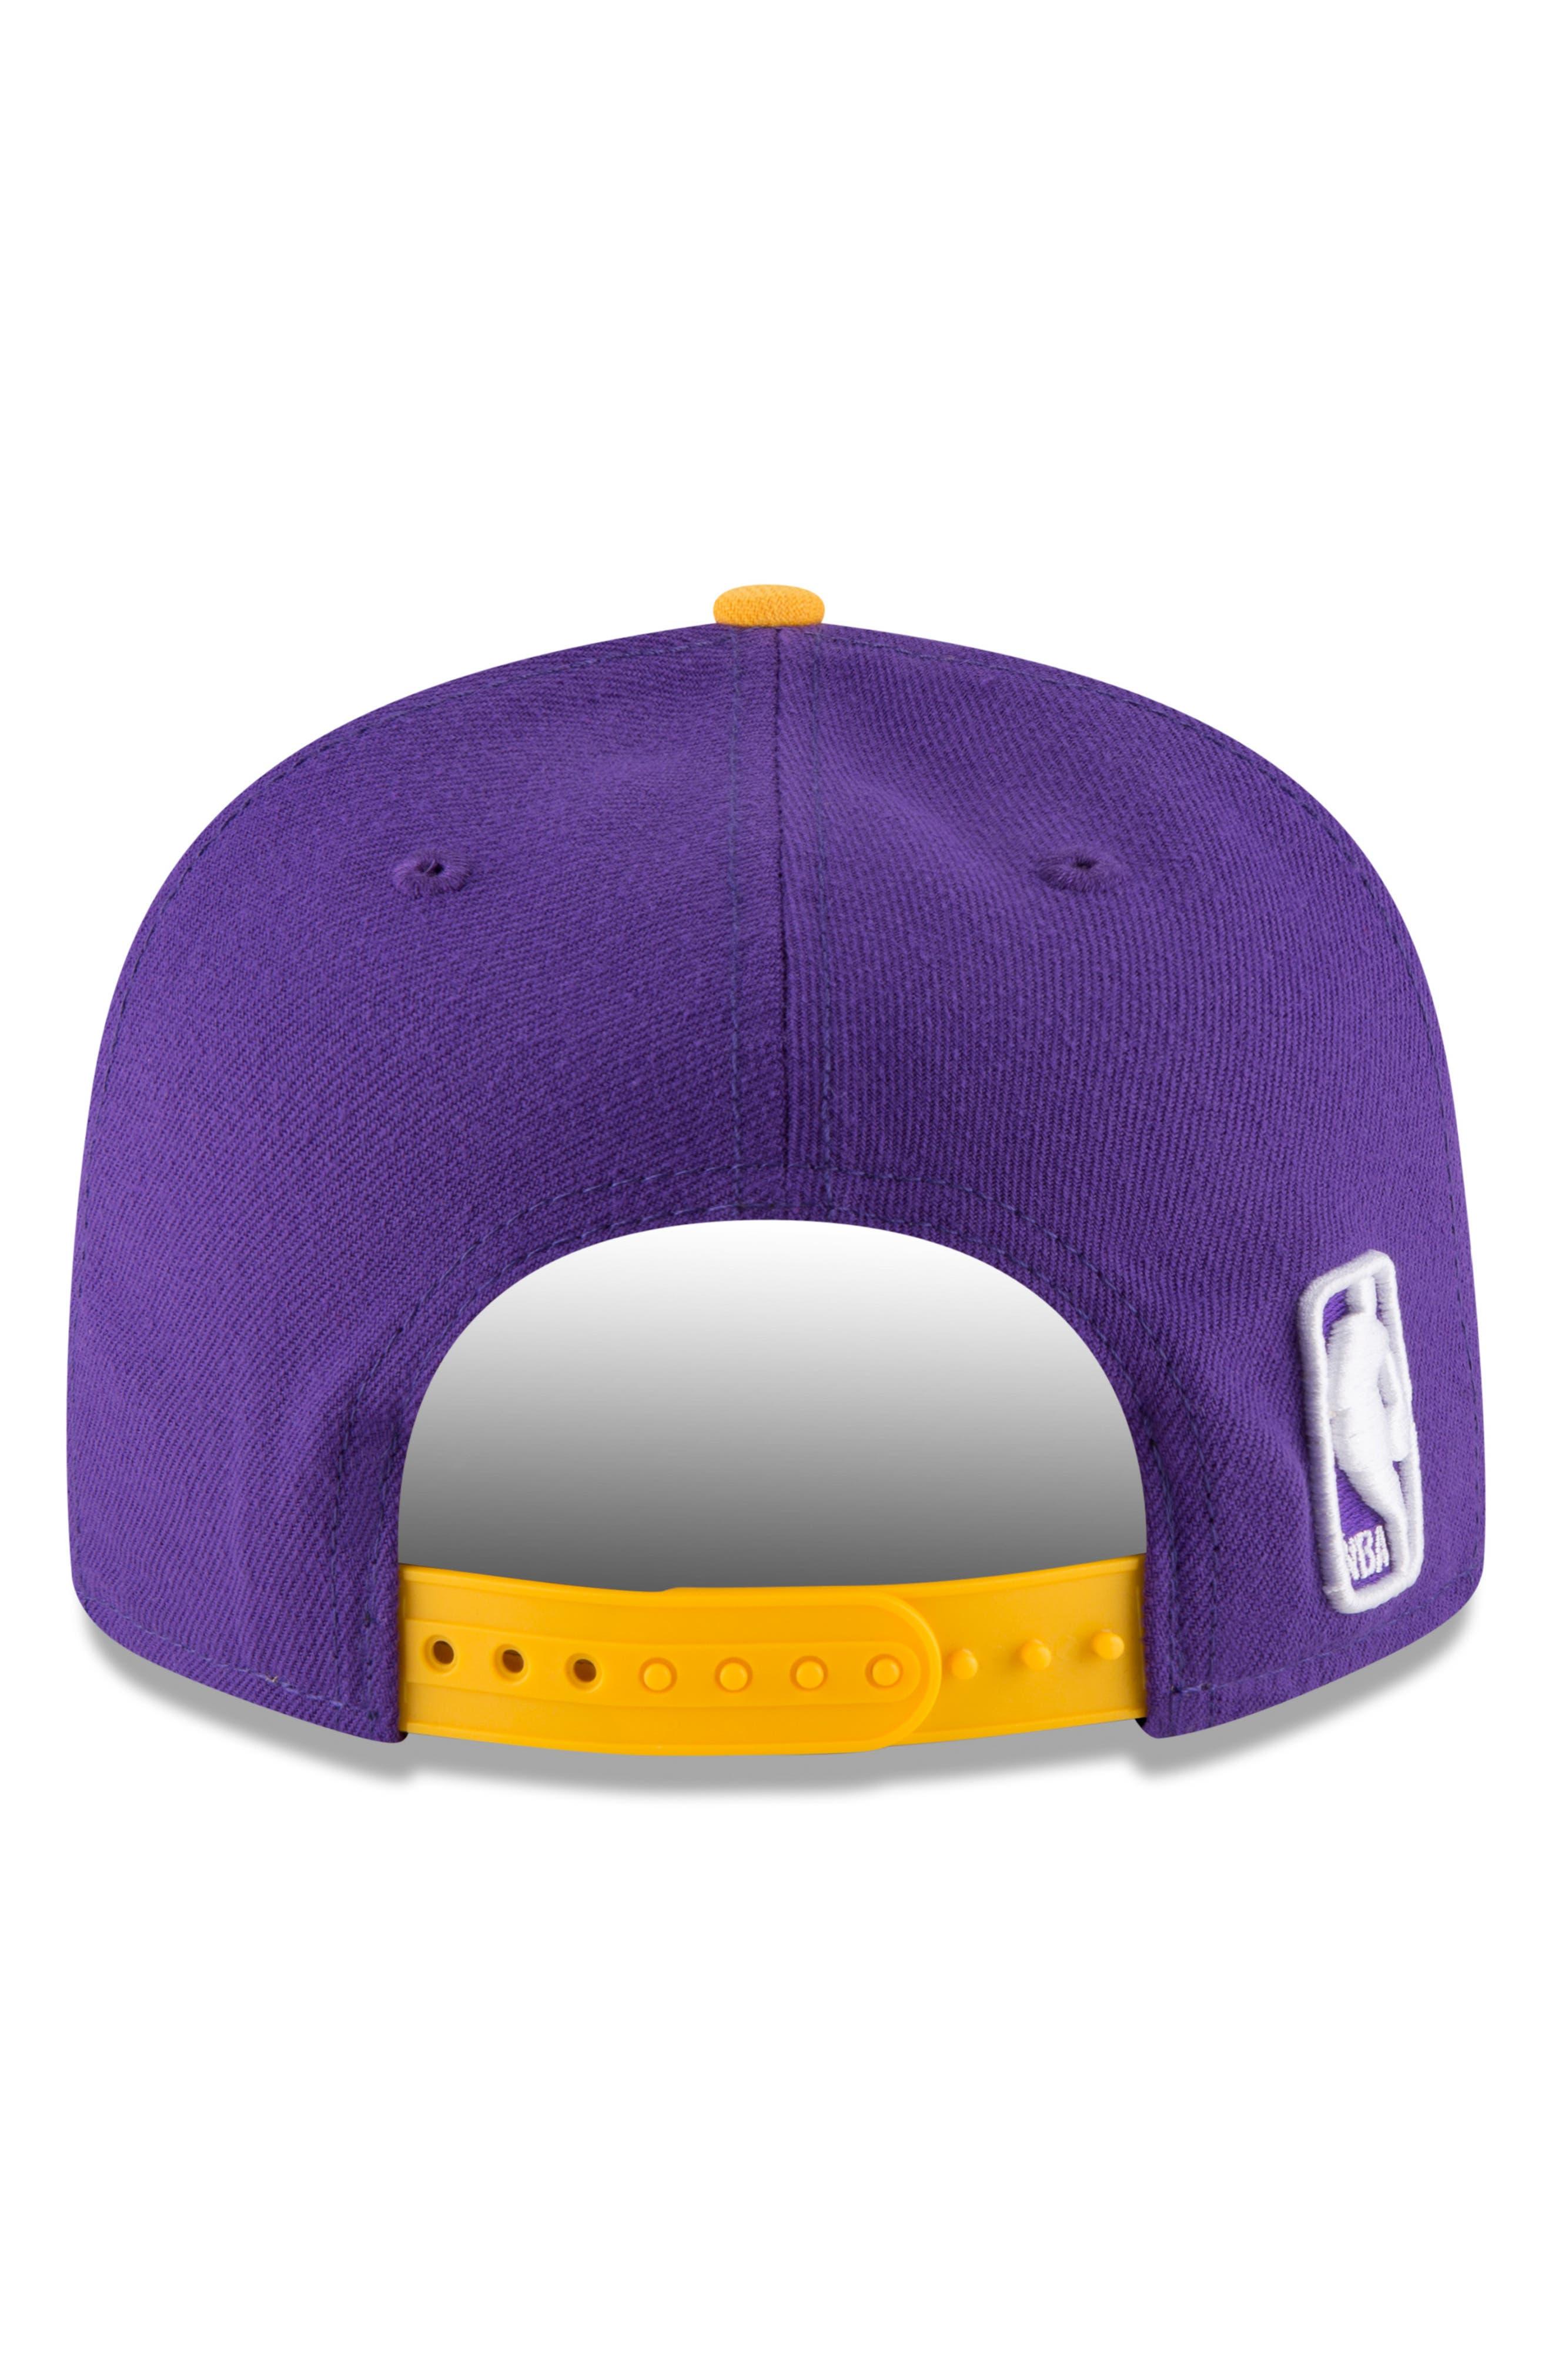 9FIFTY LA Lakers Two-Tone Cap,                             Alternate thumbnail 3, color,                             PURPLE